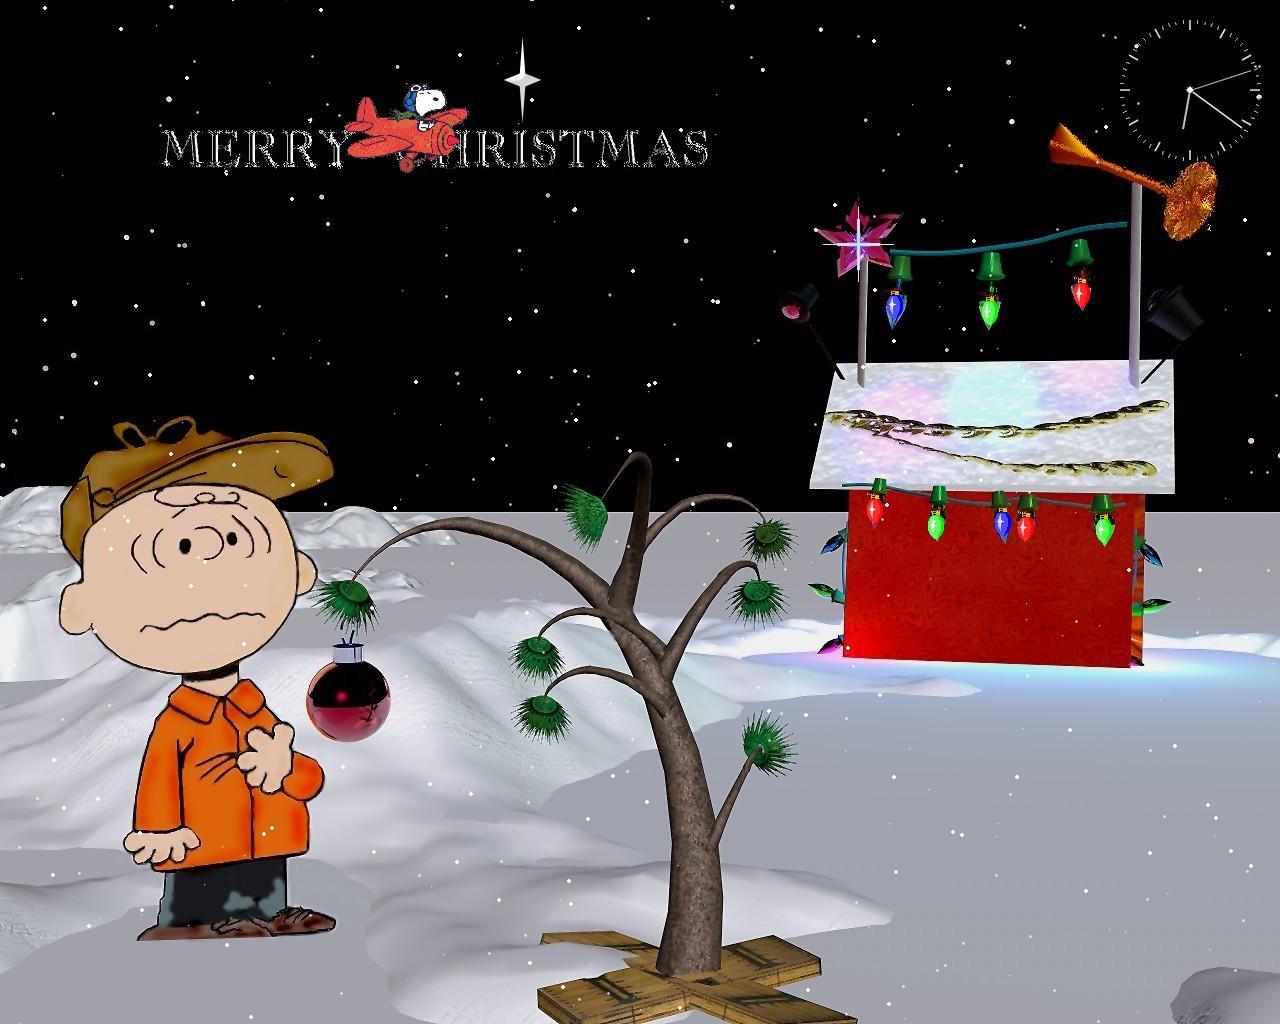 [50+] Free Charlie Brown Christmas Wallpapers on ...